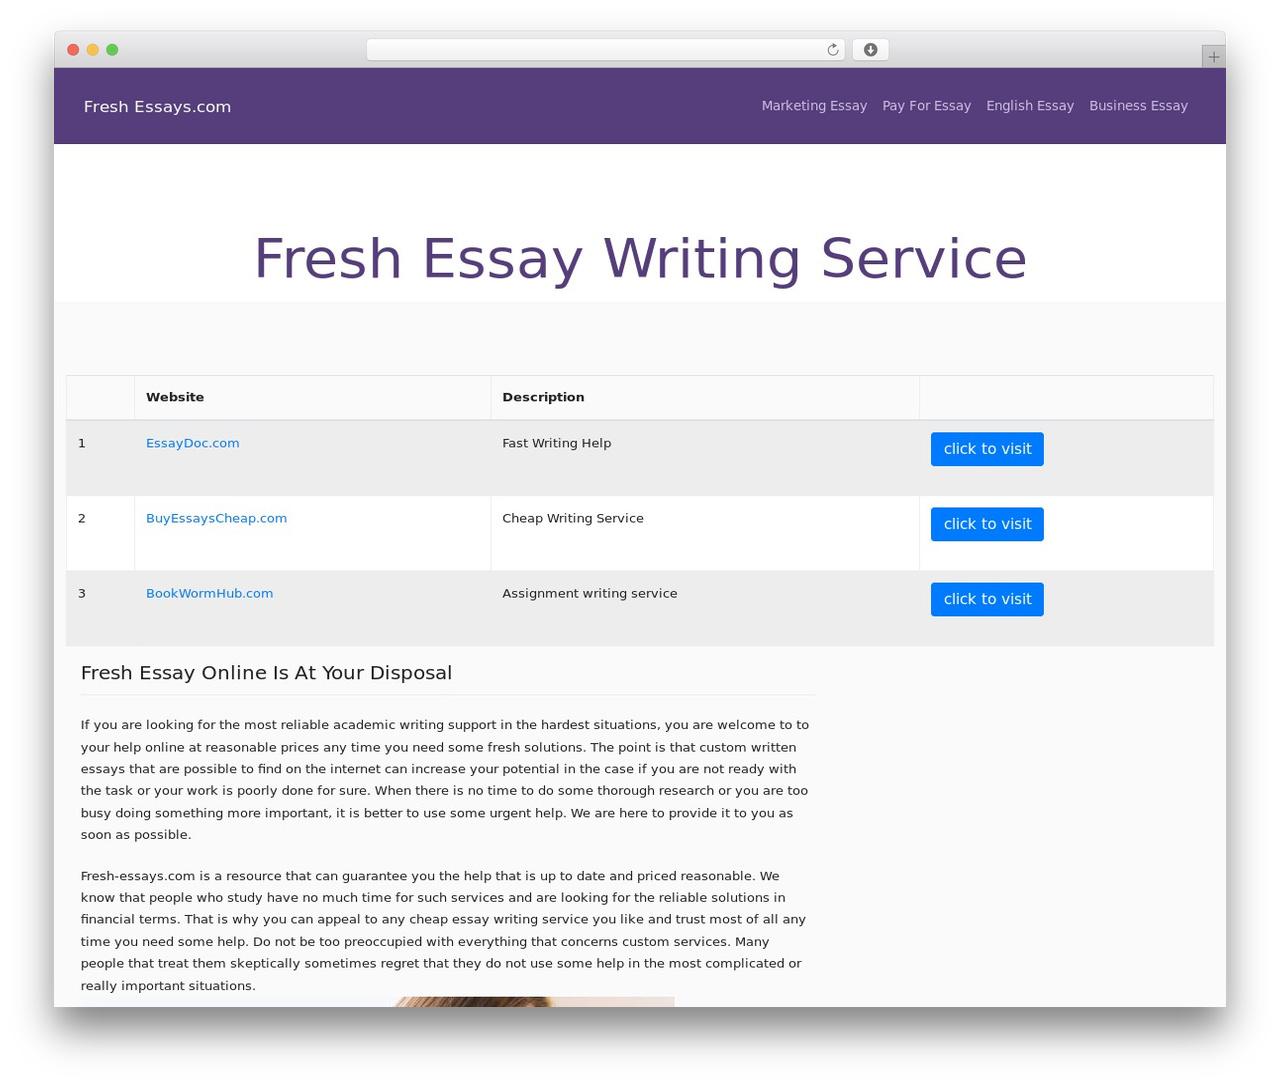 010 Material Design Wp Best Free Wordpress Theme 7cr4 O Fresh Essays Essay Wondrous Contact Uk Full